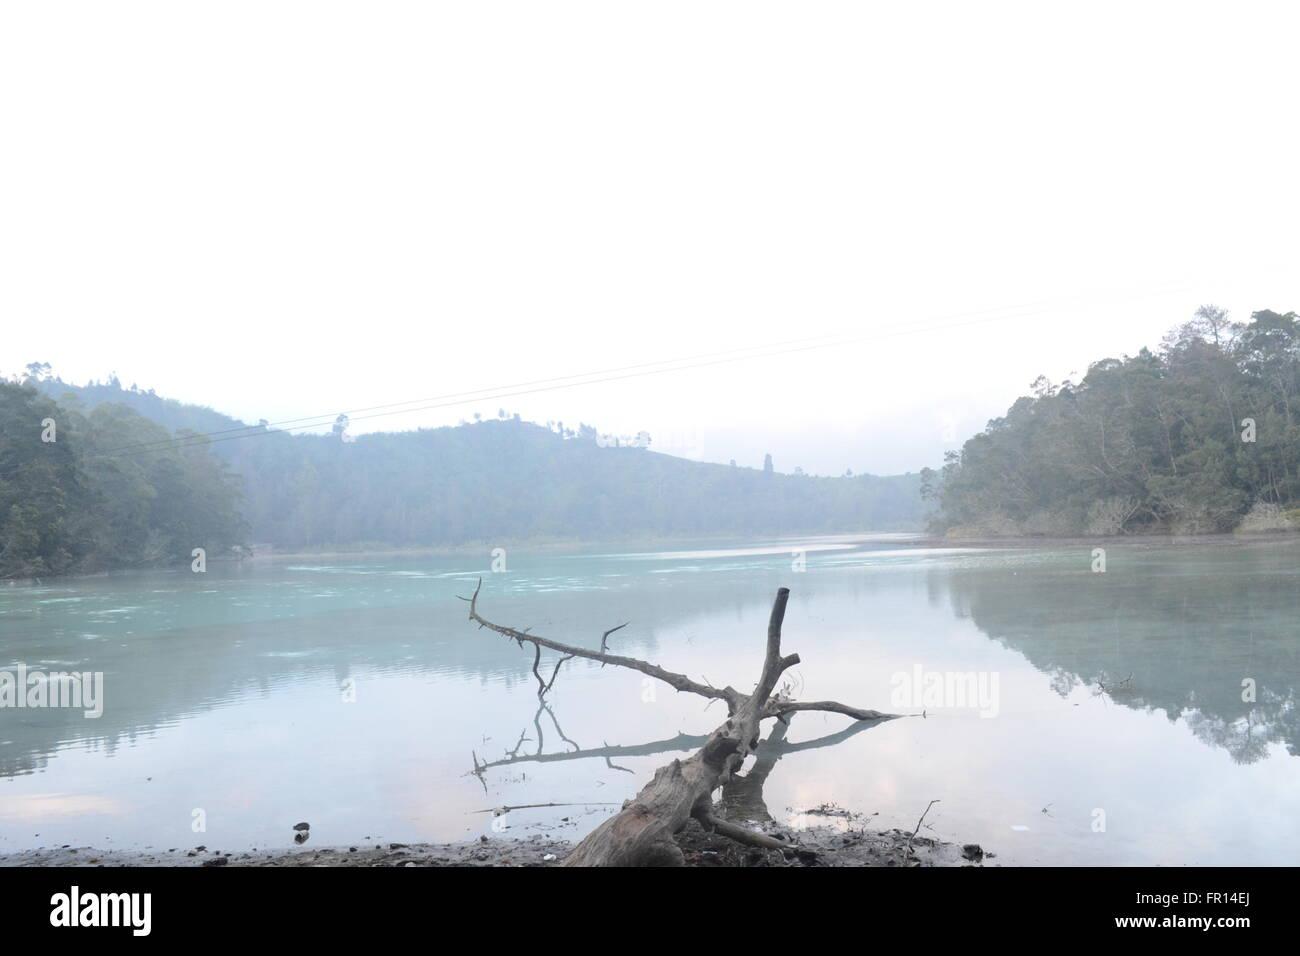 Telaga Warna Lake, Dieng, Central Java, Indonesia - Stock Image